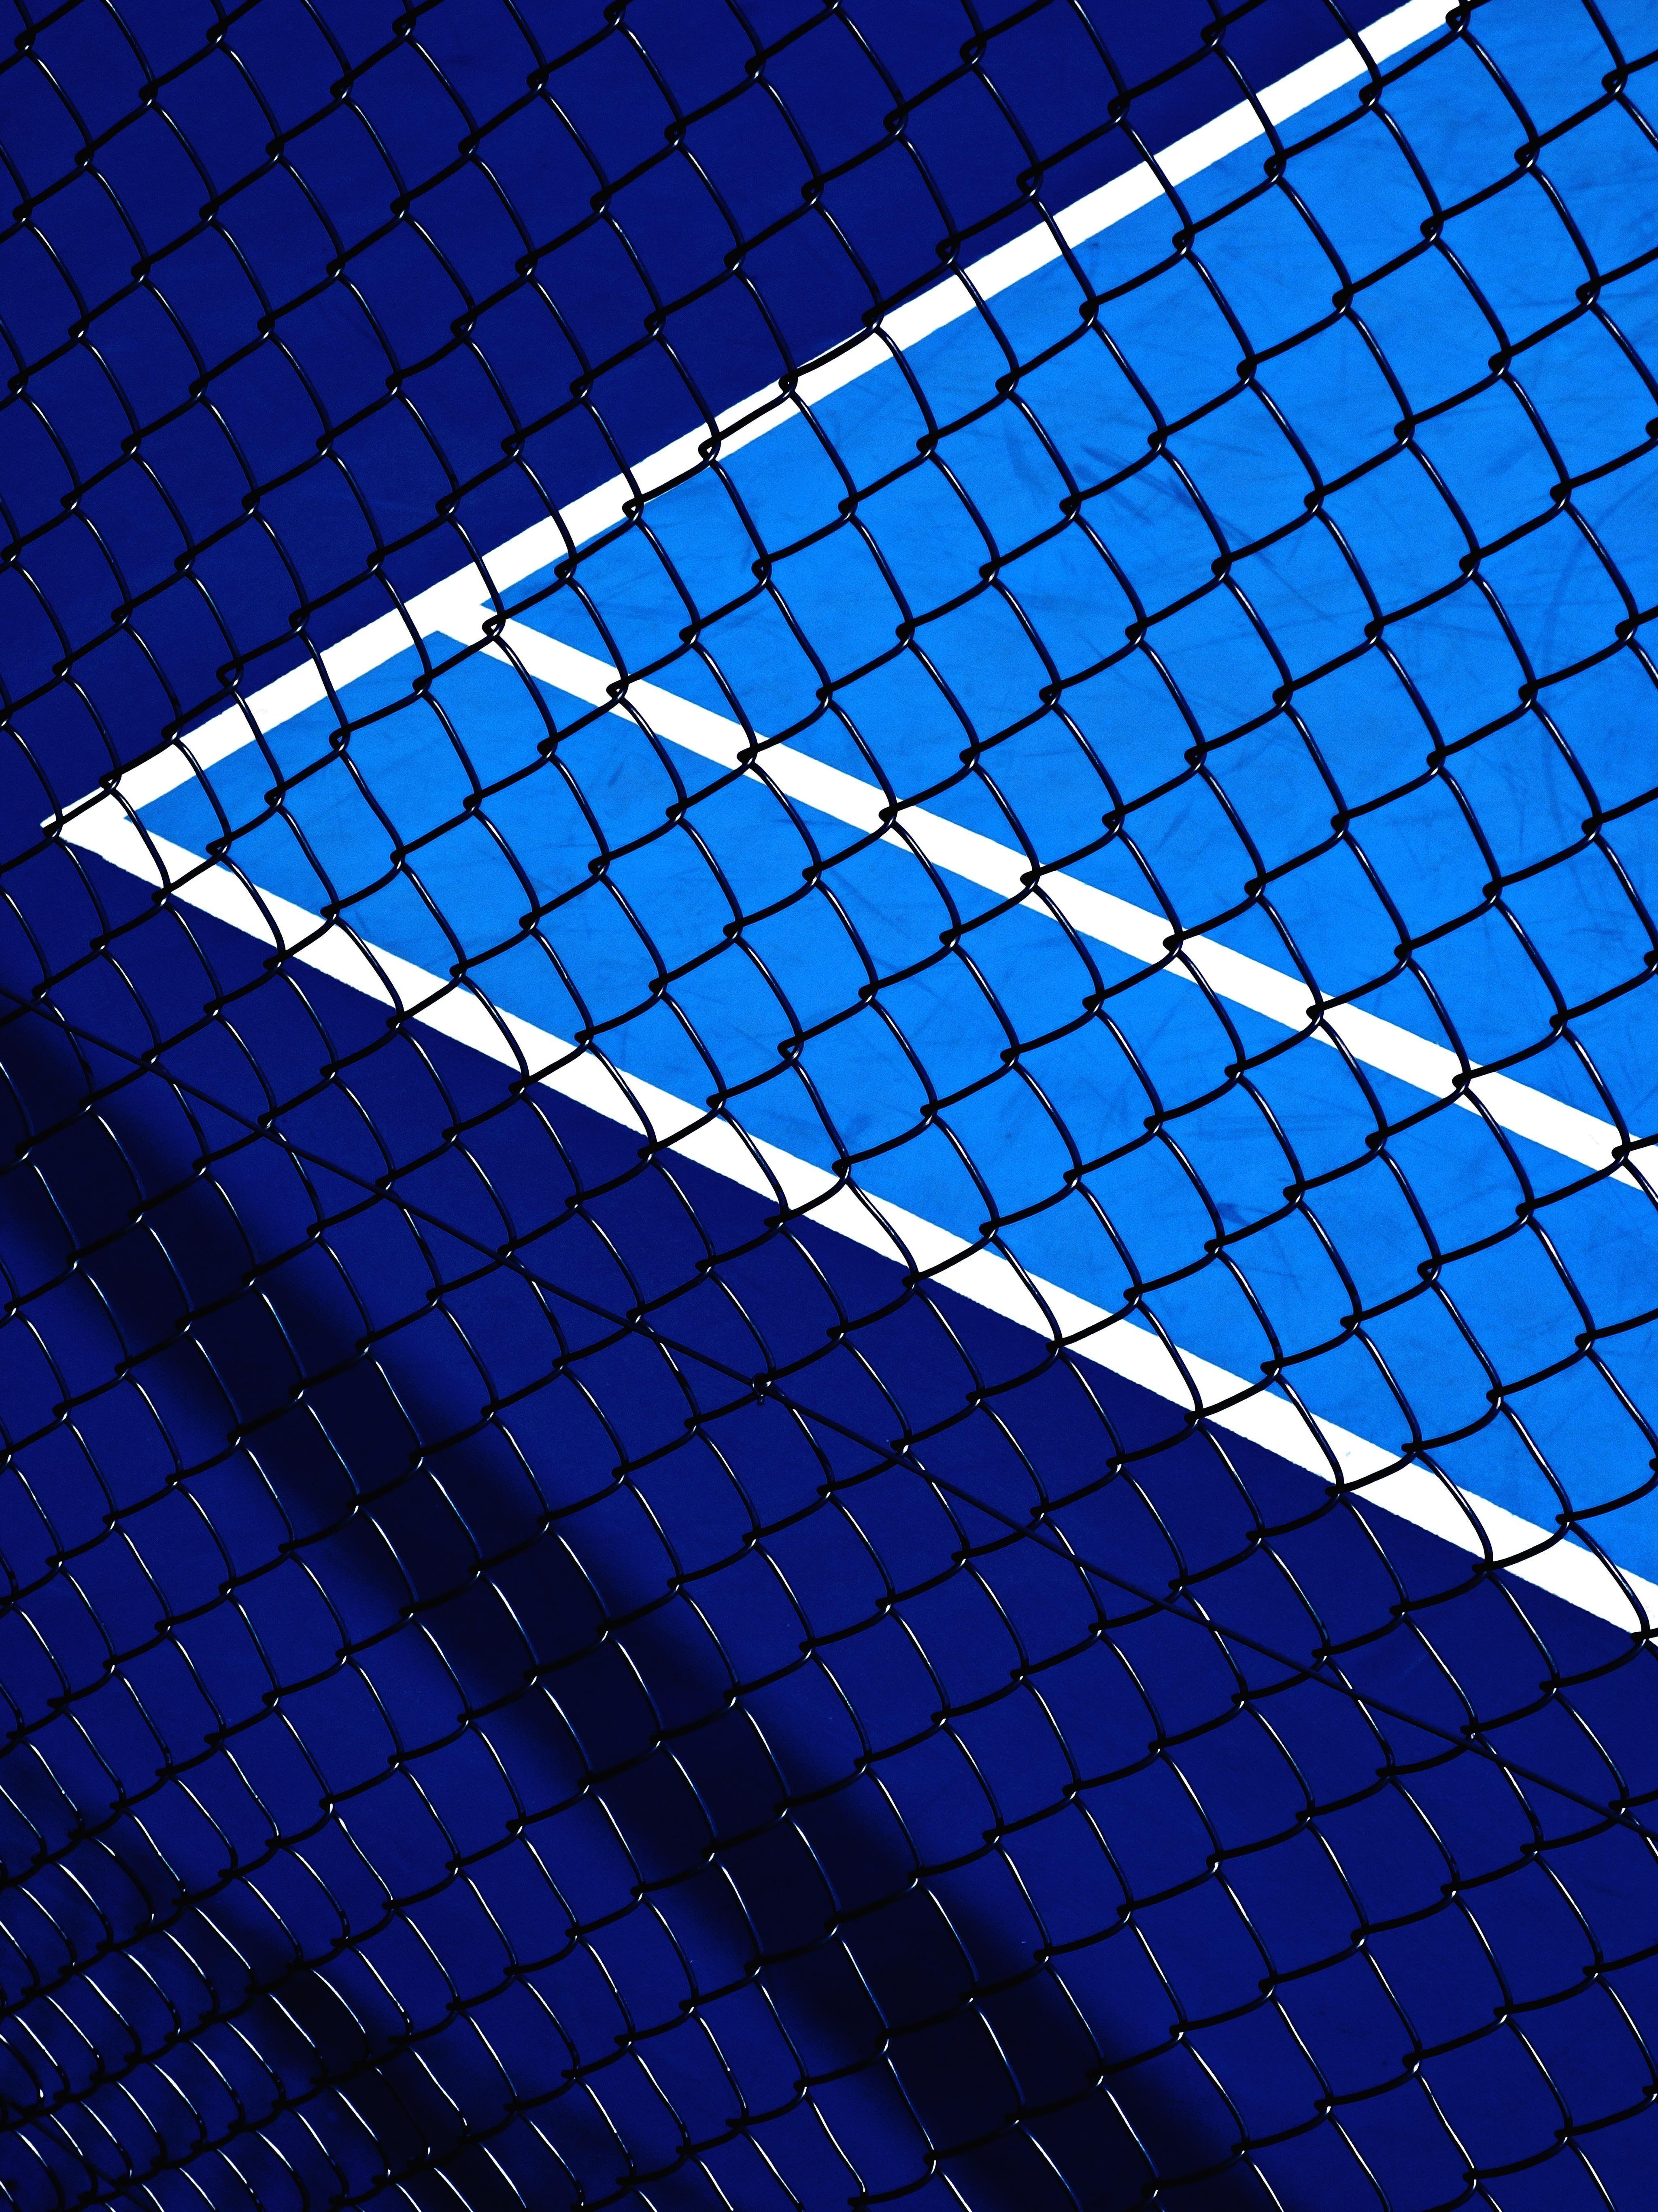 Tennis court 4K Stock iPad Pro Mesh fence 5K wallpaper